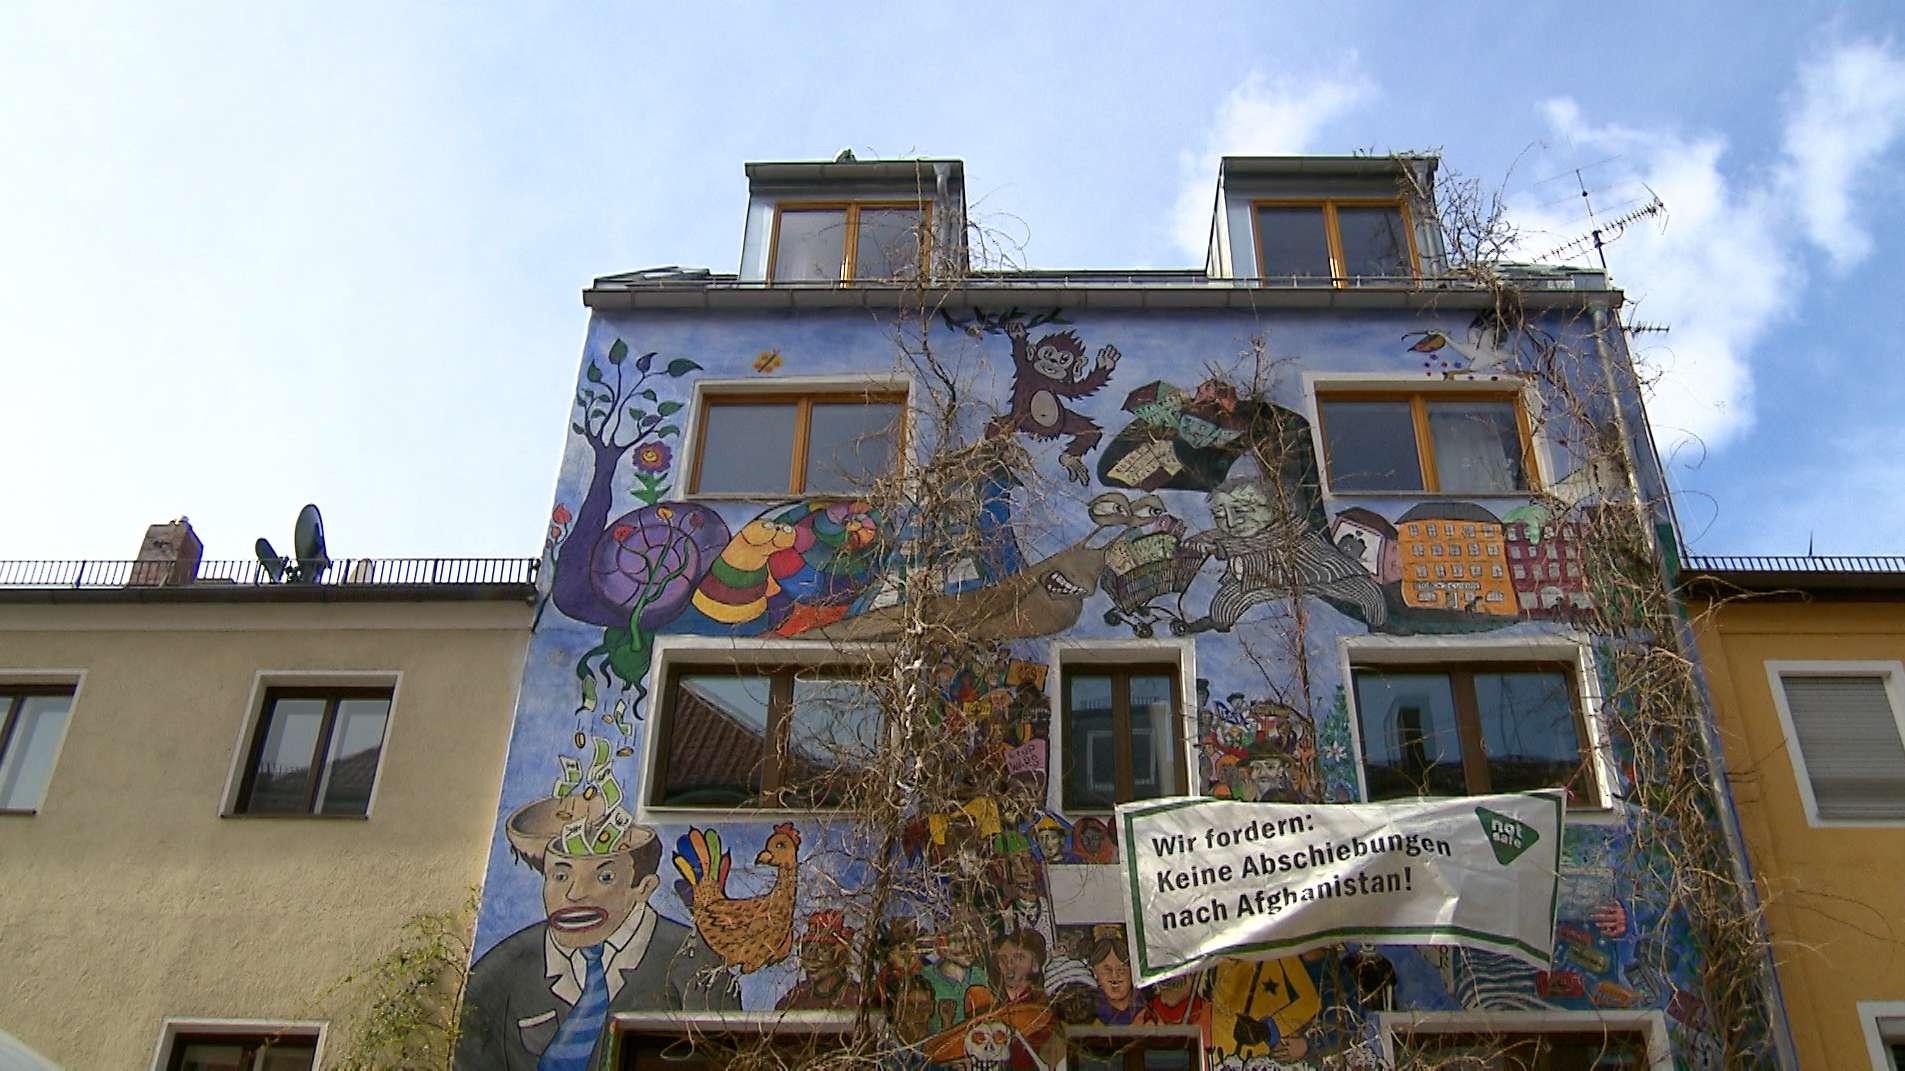 Mietshaussyndakts-Projekt in München